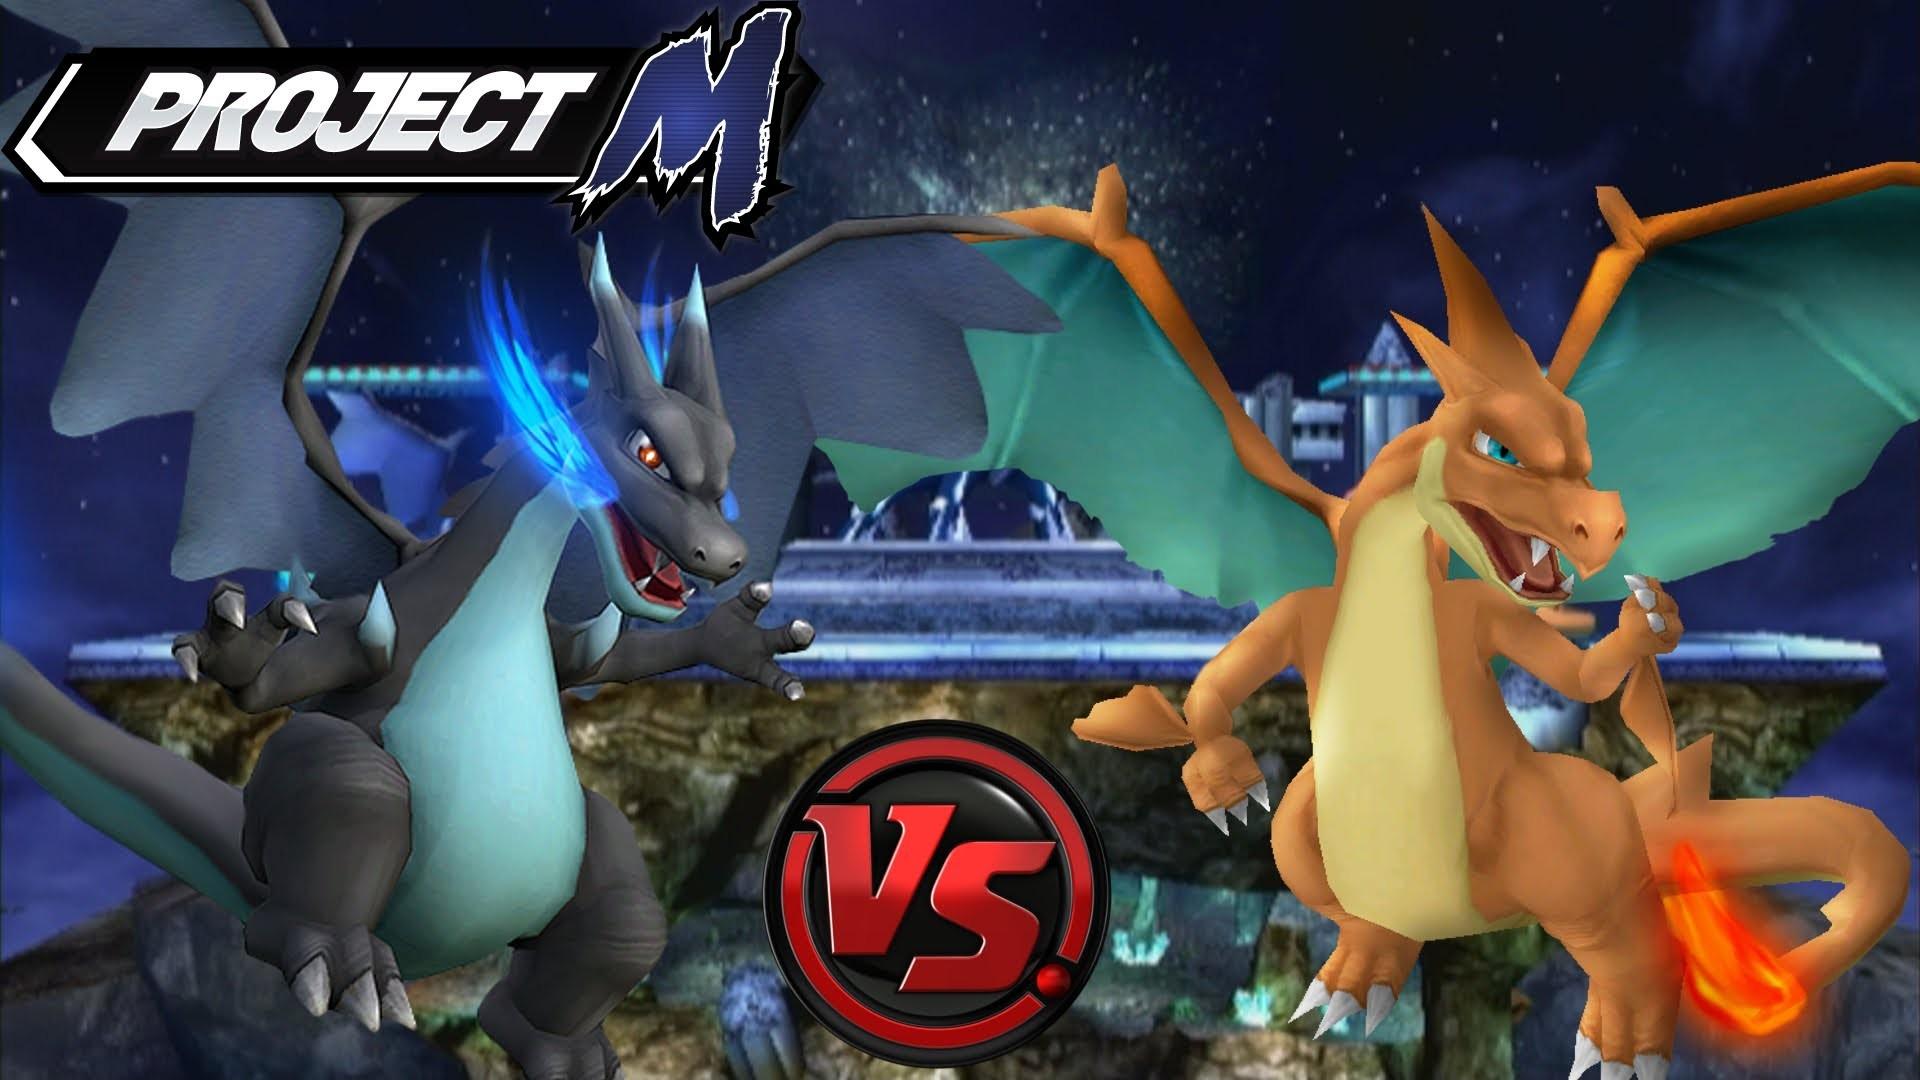 Project M: Mega Charizard Y vs. Mega Charizard X